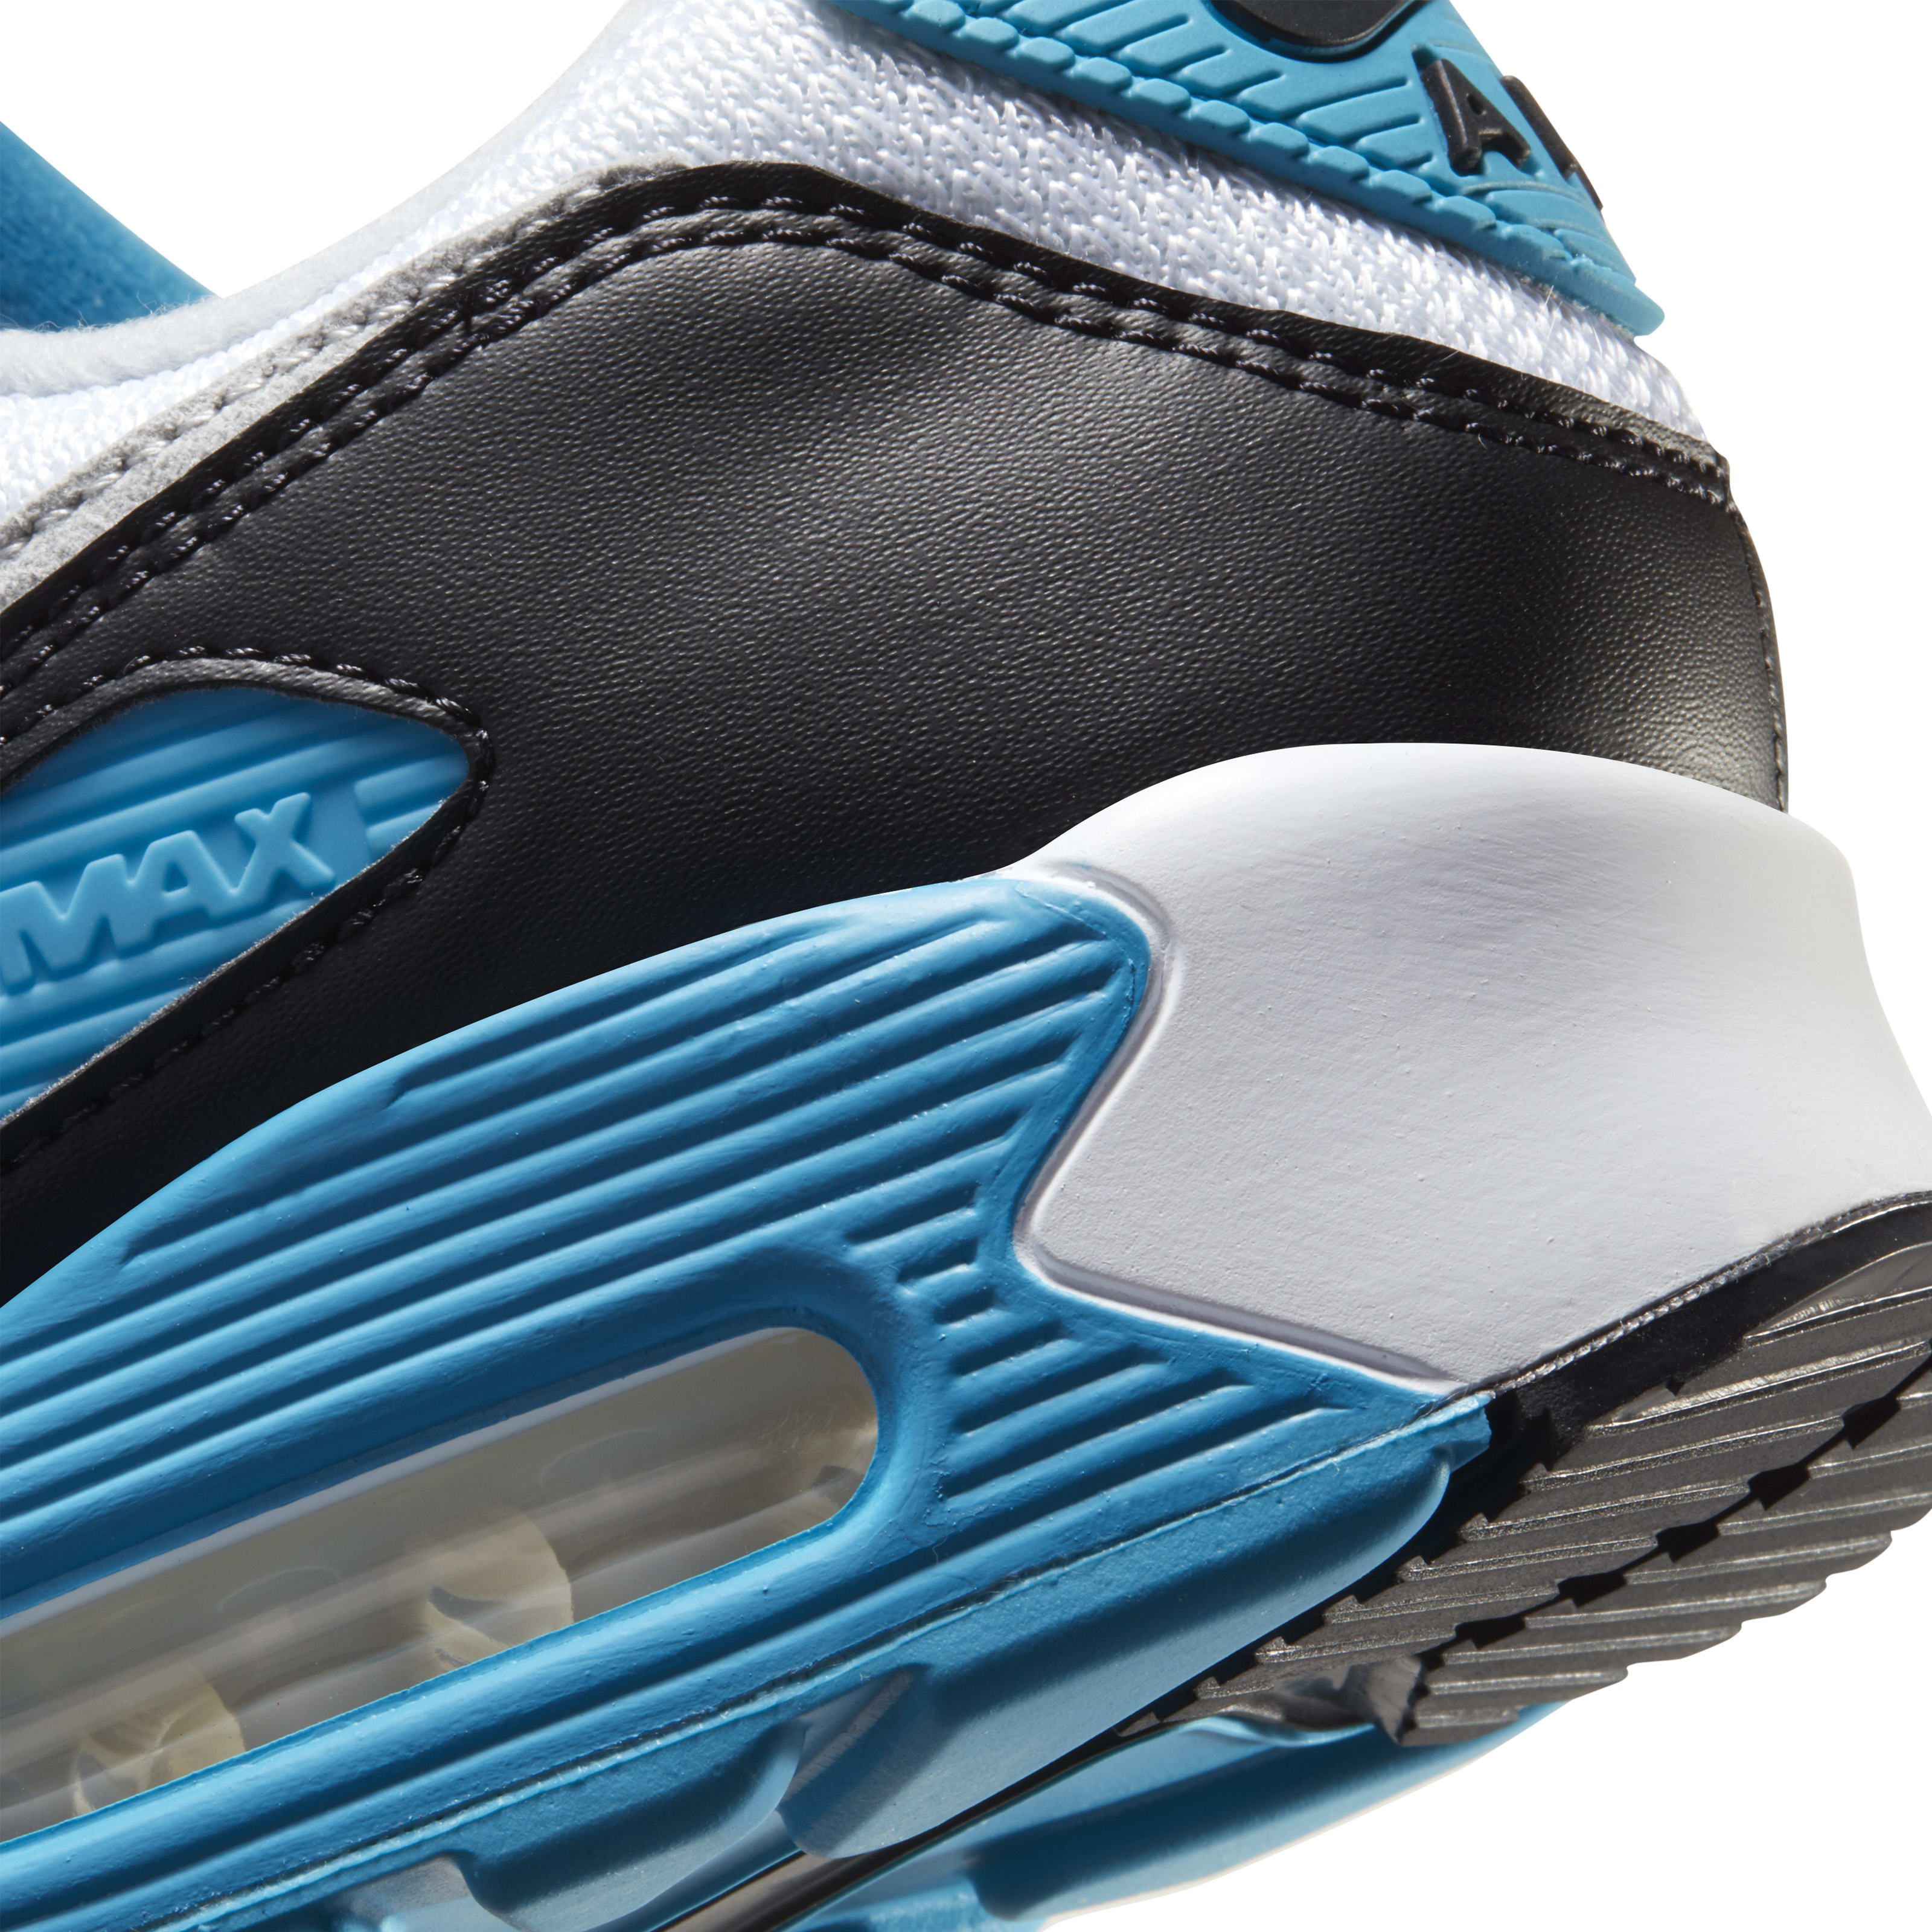 Nike Air Max 90 'Laser Blue' 2020 Heel